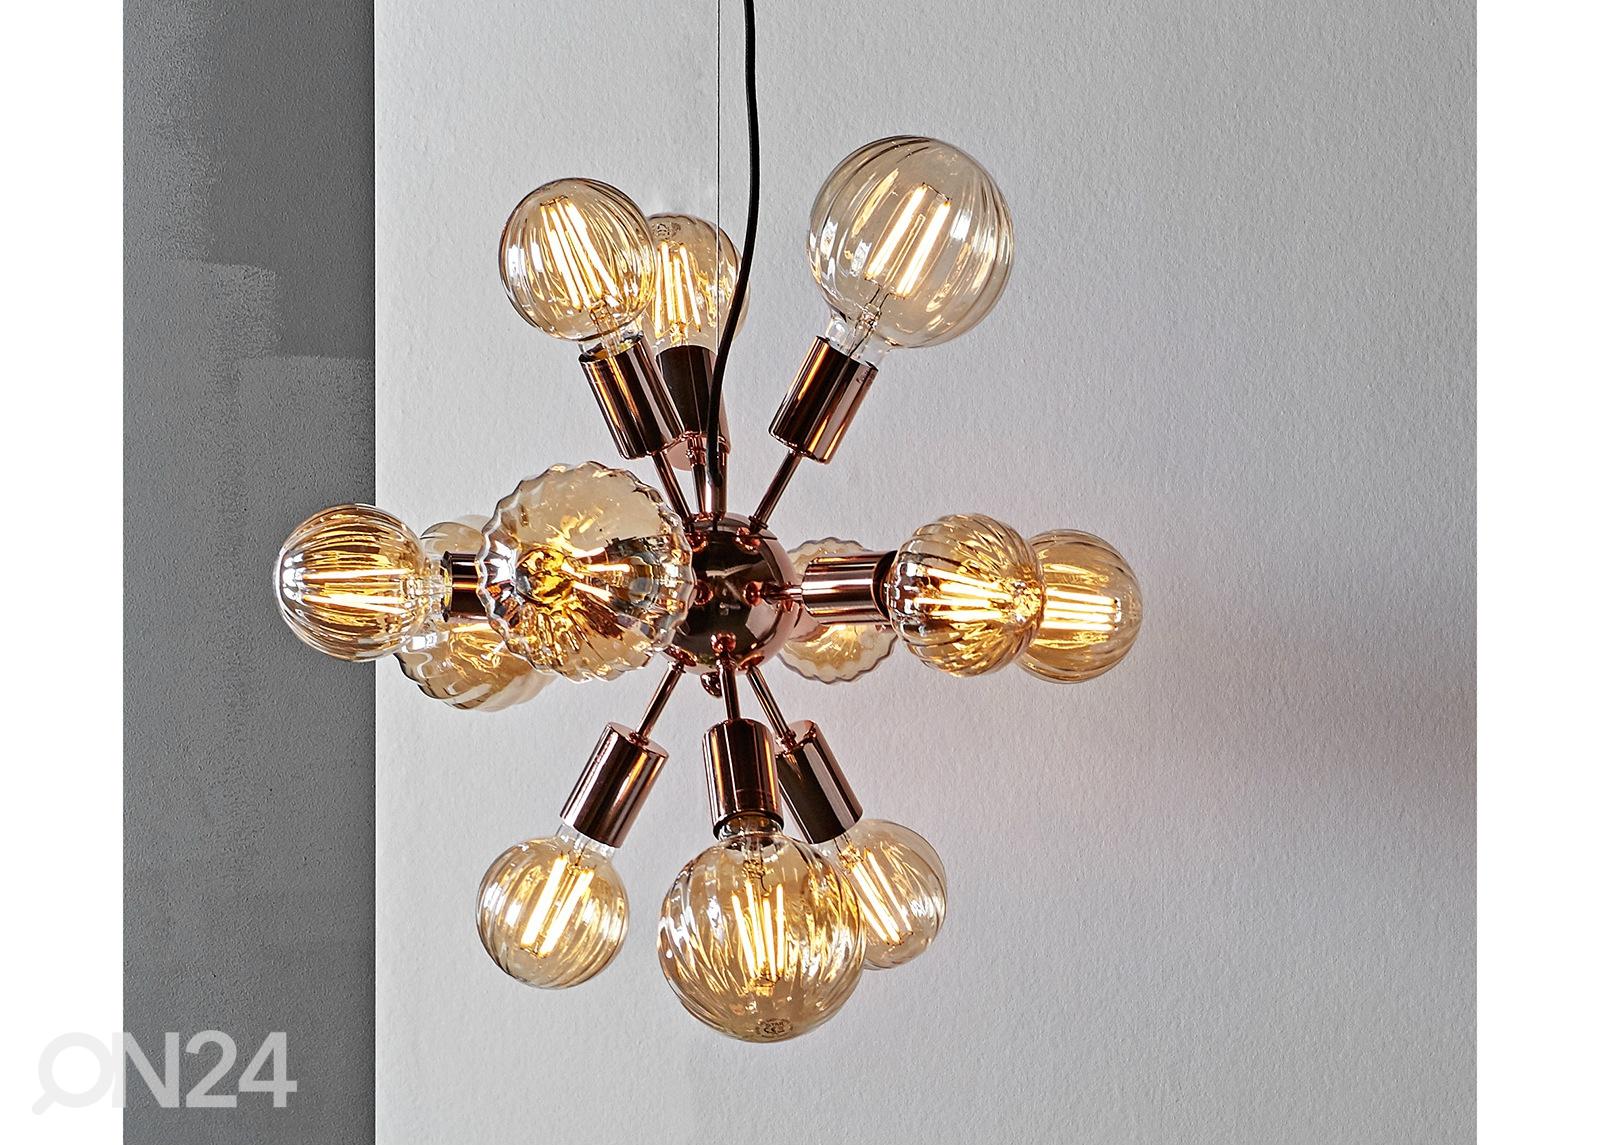 444a08f7e25 Dekoratiivne LED pirn E27 2,5 W AA-152675 - ON24 Sisustuskaubamaja